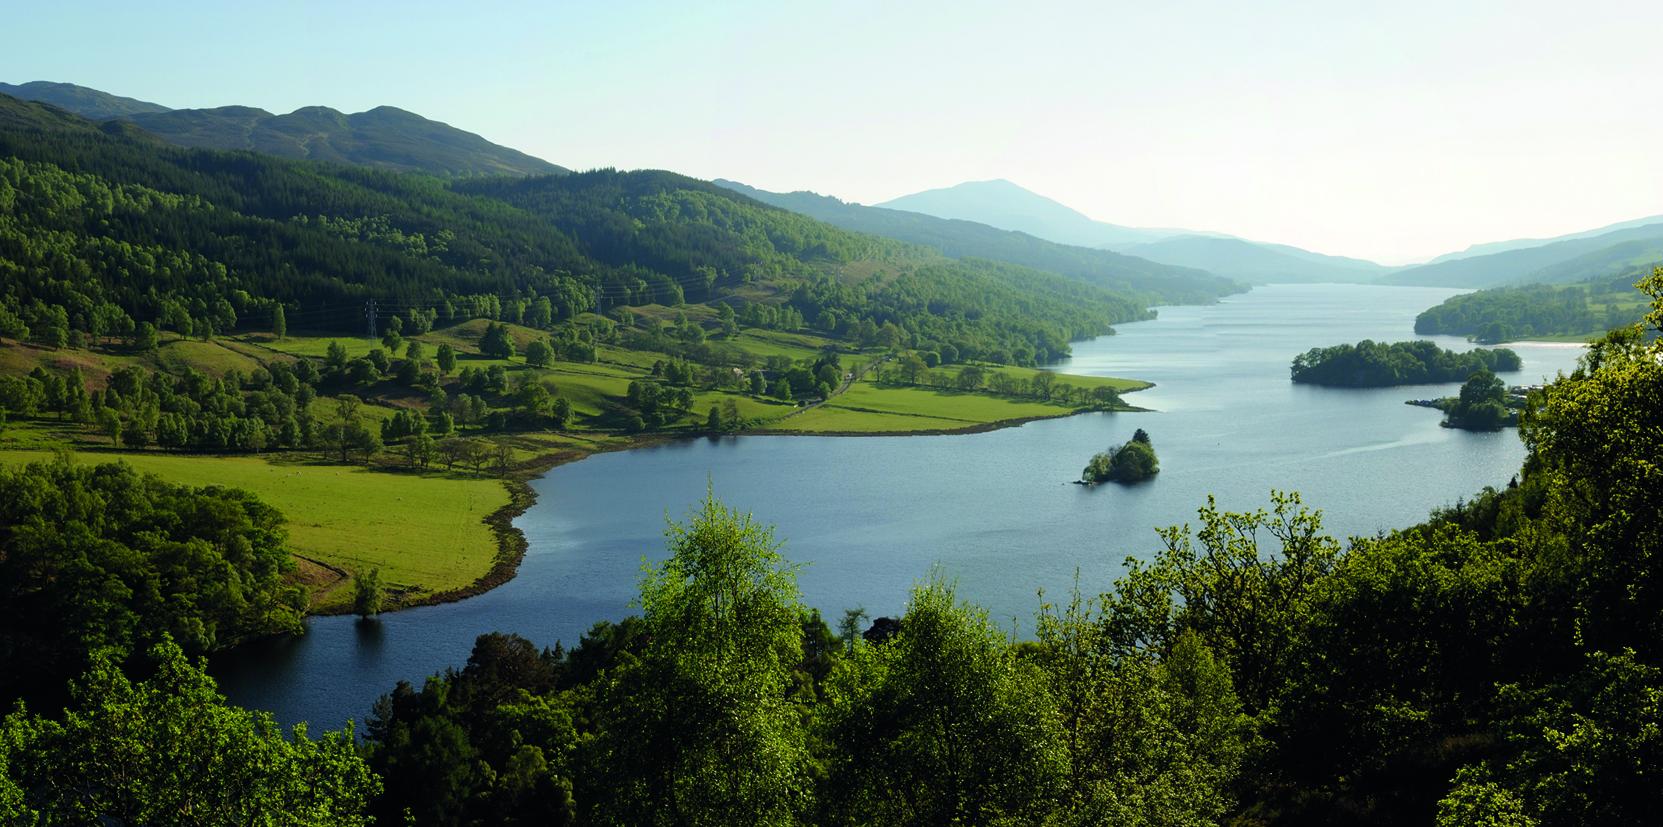 The Queens View at Loch Tummel